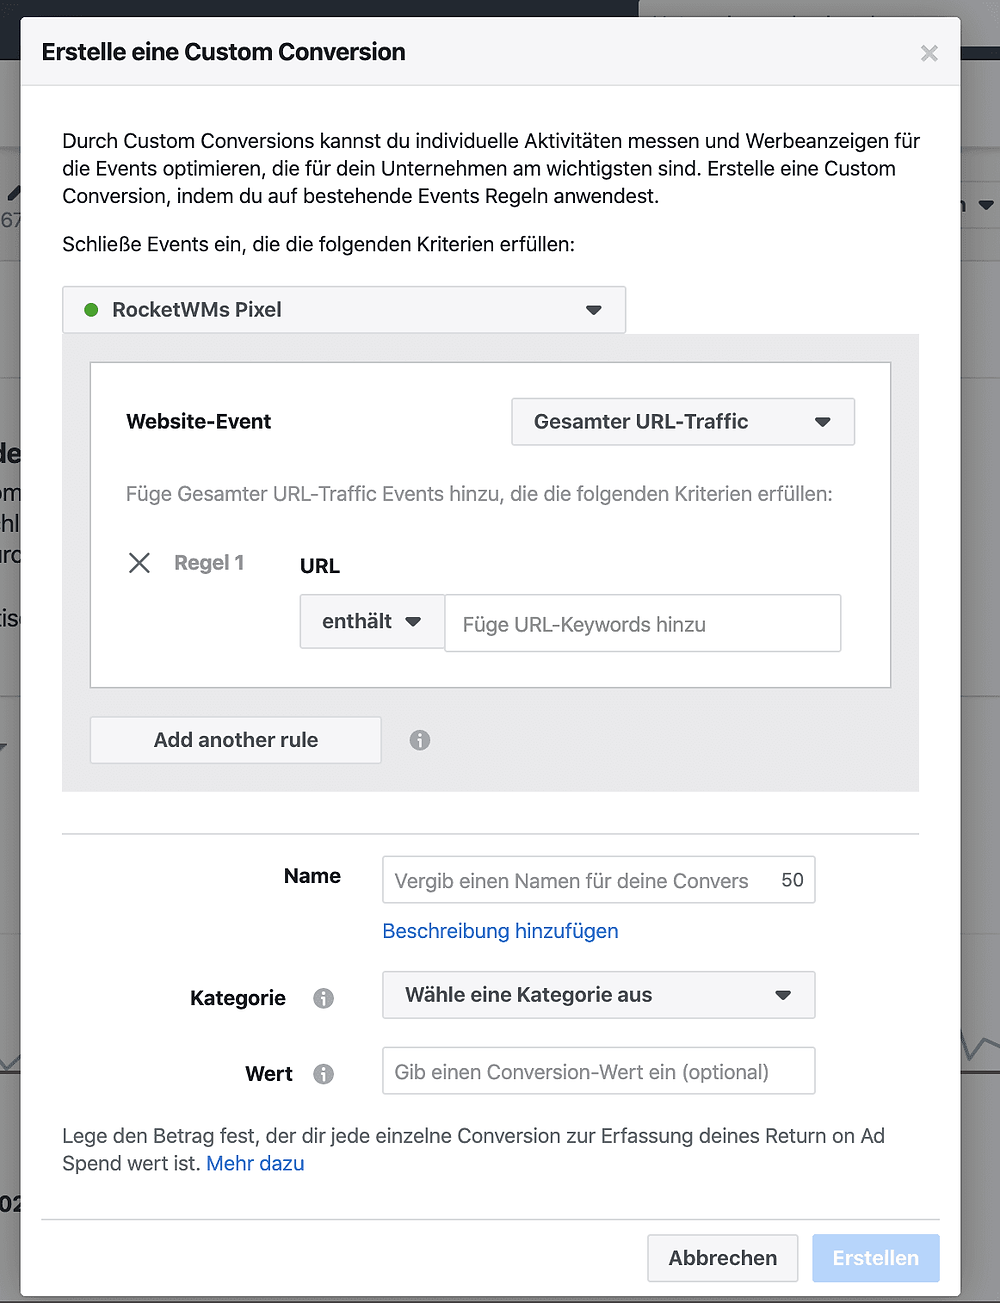 Custom Conversion mittels Facebook Pixel Tracking erstellen